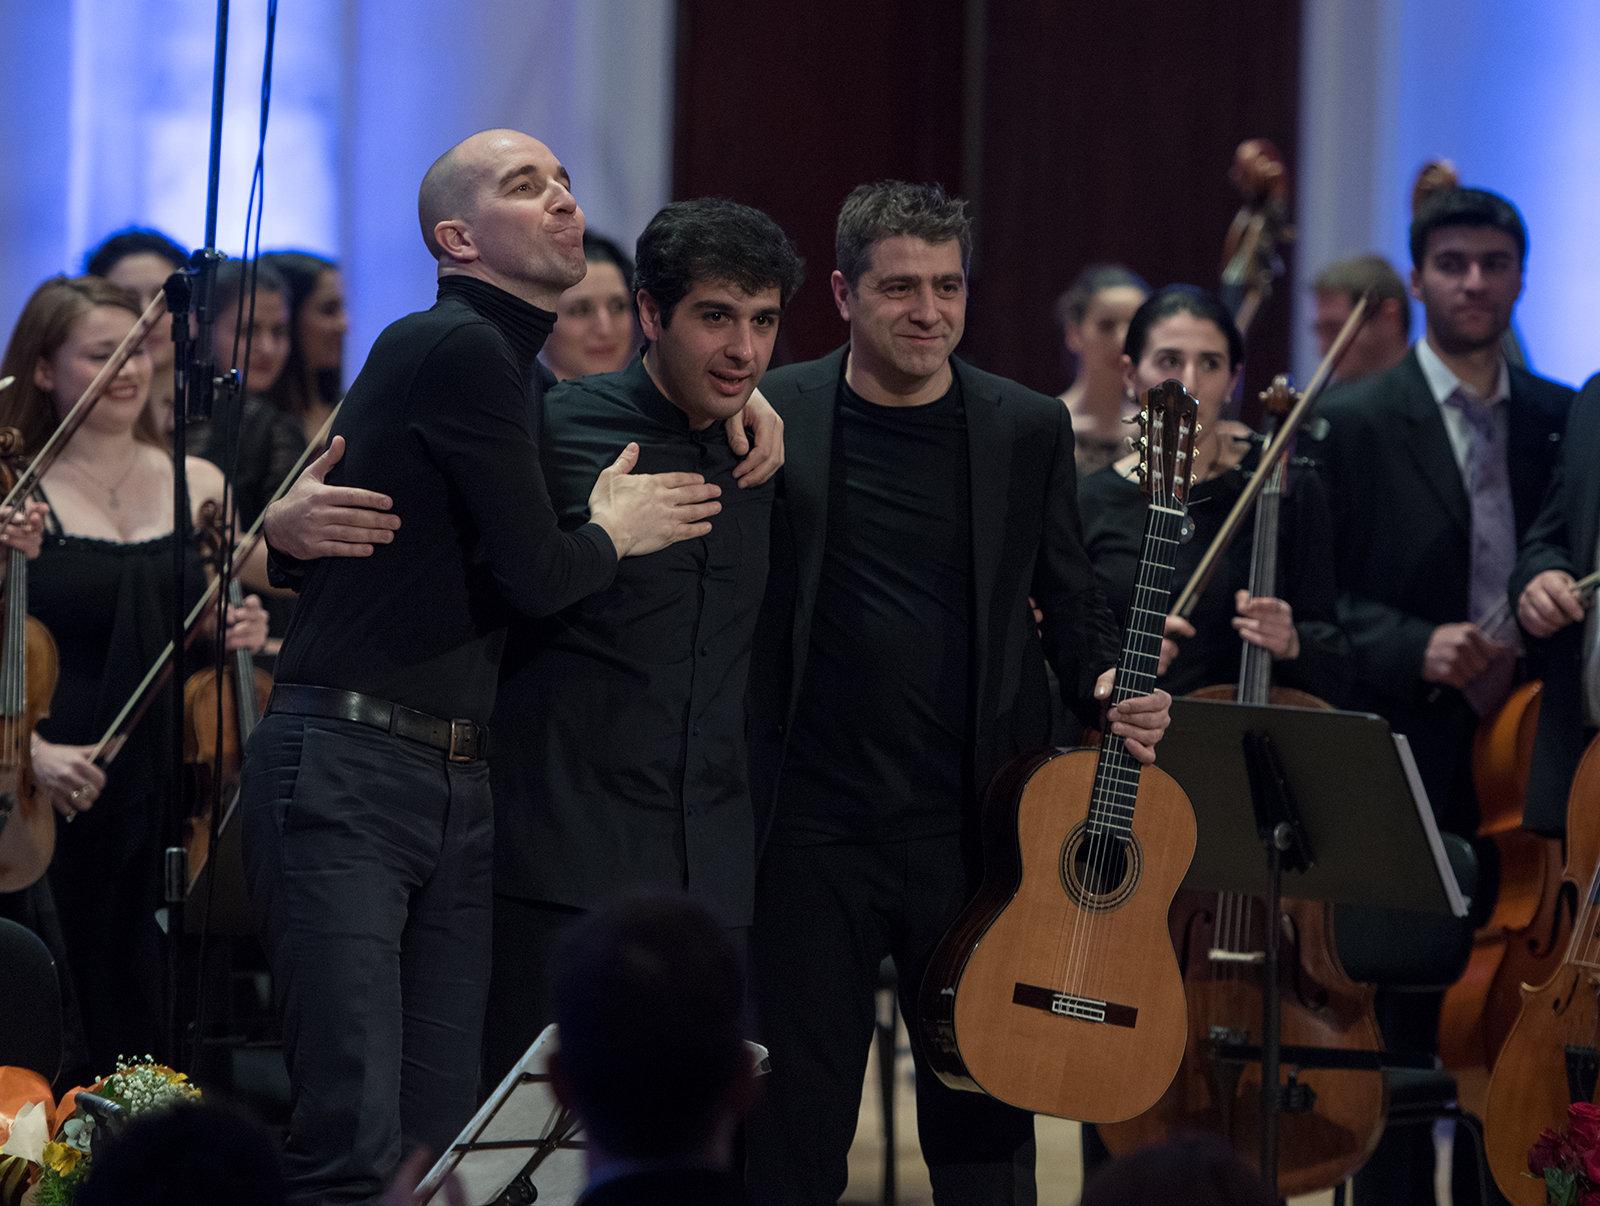 Марио Стефано Пьетродарки, Сергей Смбатян, Лука Лючини